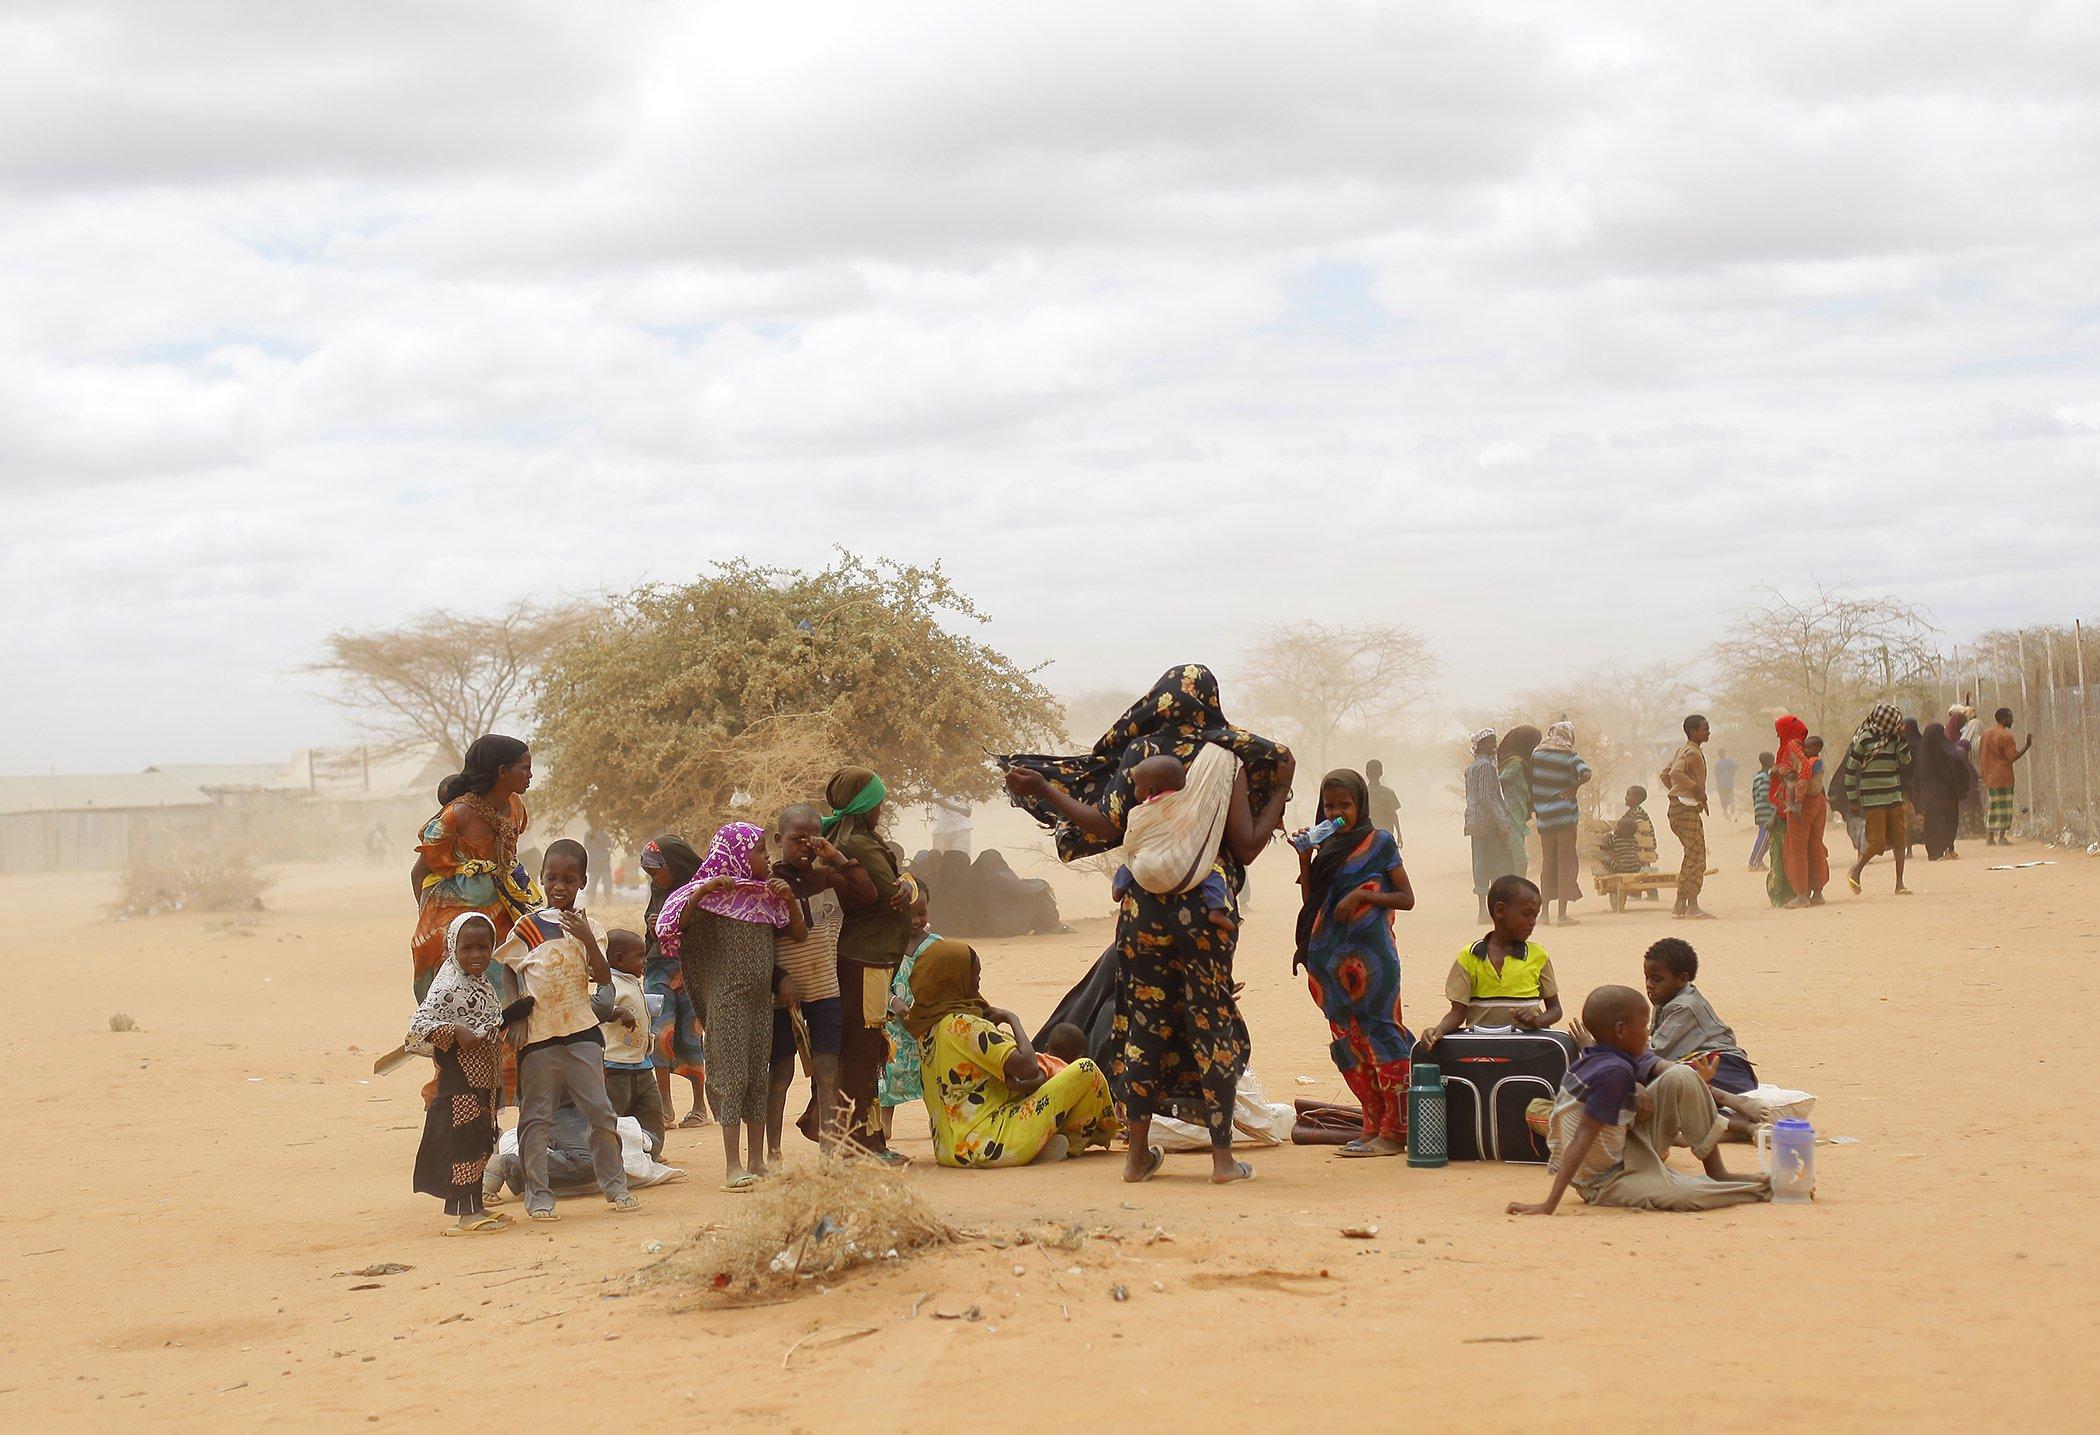 Climate-Change-Migration-Refugees-Somalia-Famine.jpg